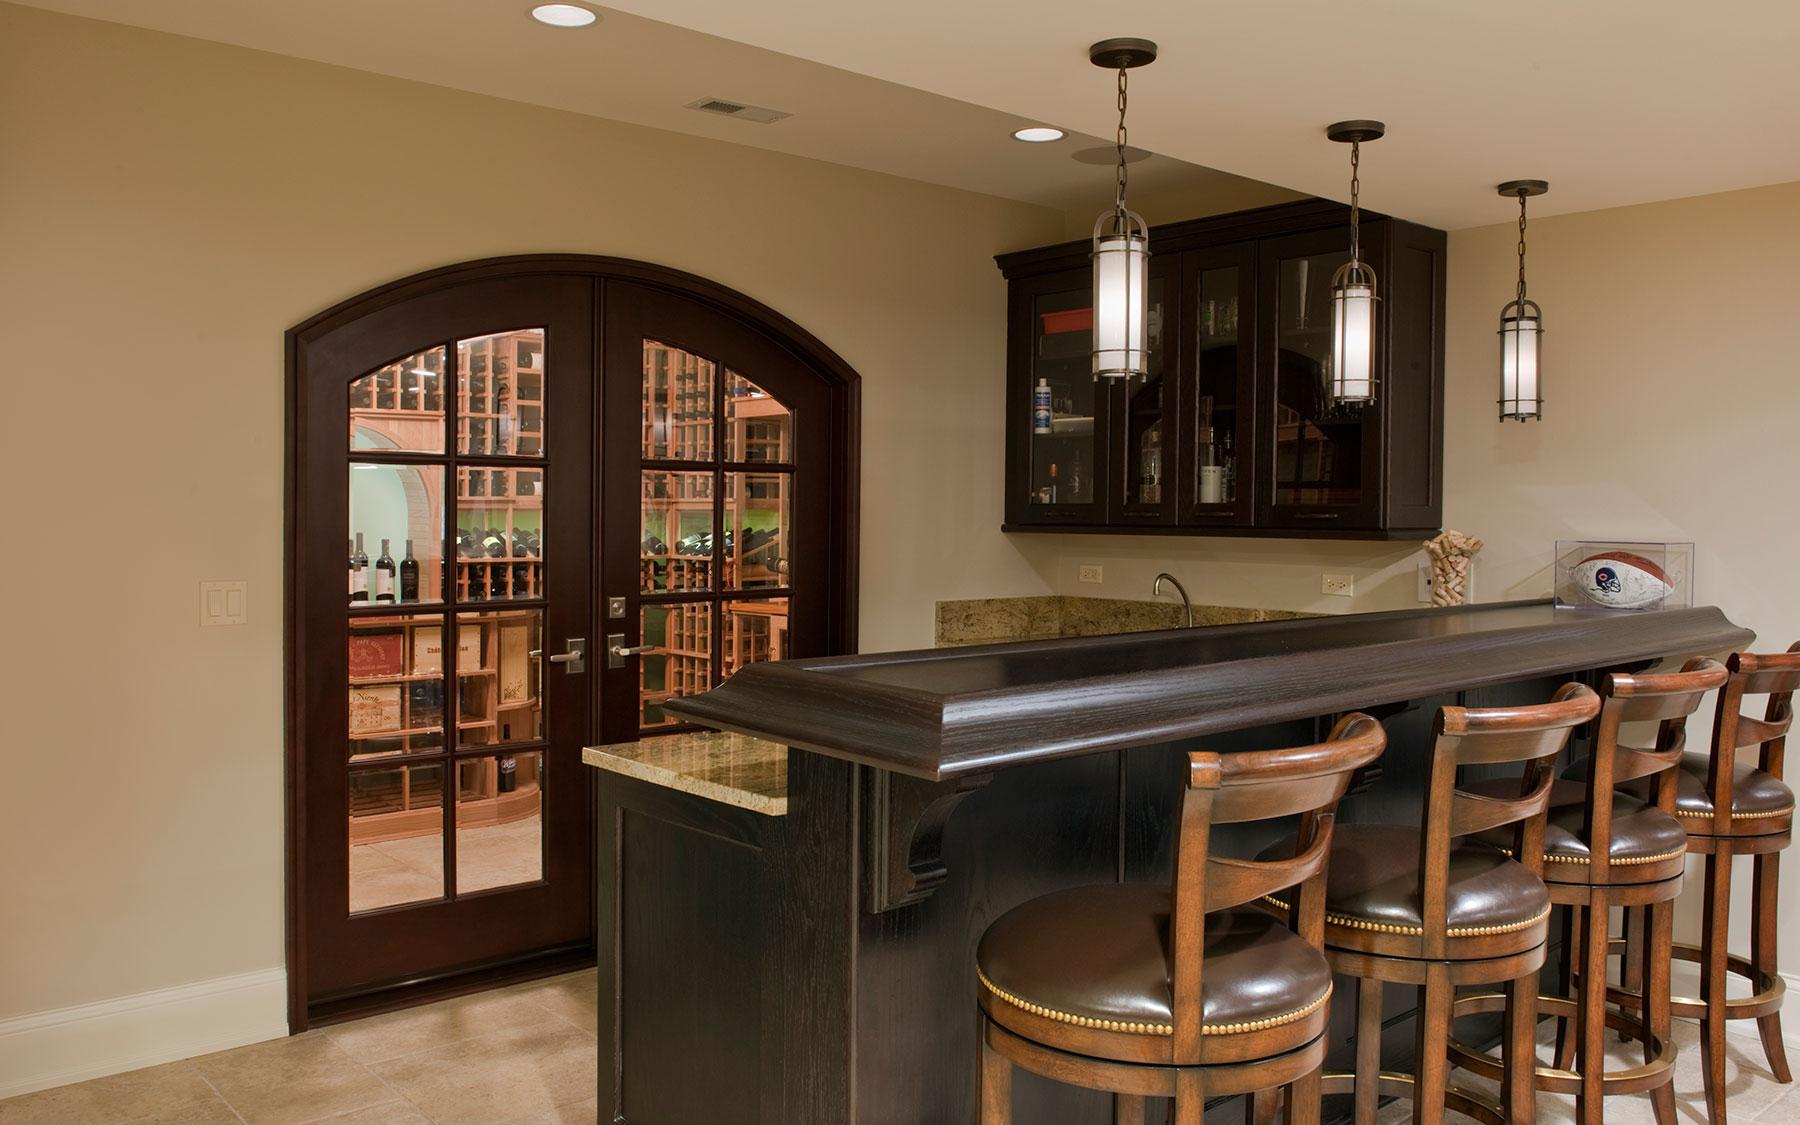 Custom Wood Interior Doors | Custom Interior Arched Top Double Door, Clear Glass with Bevel For Wine Cellar DBI-916A DD - Glenview Doors - Custom Doors in Chicago